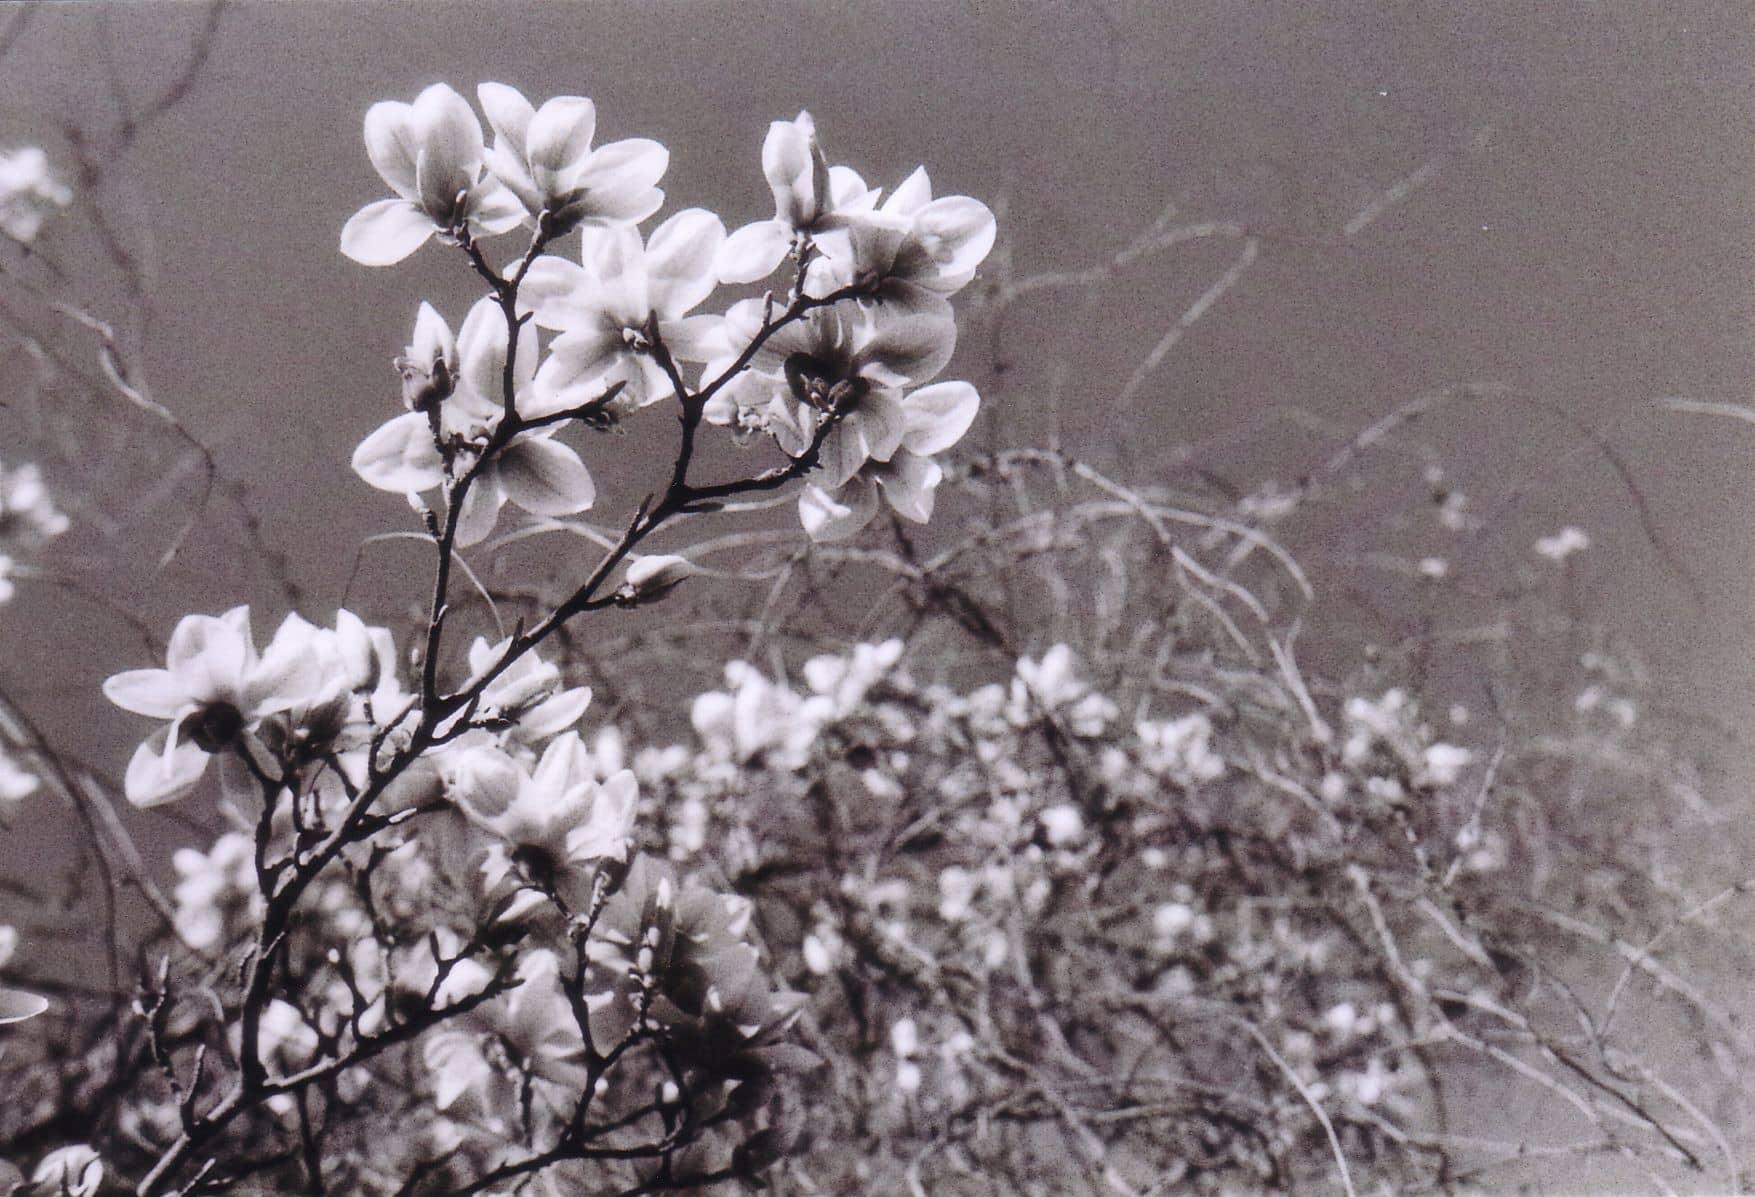 Magnolien - Analoge Fotografie by Nadin Wunderlich